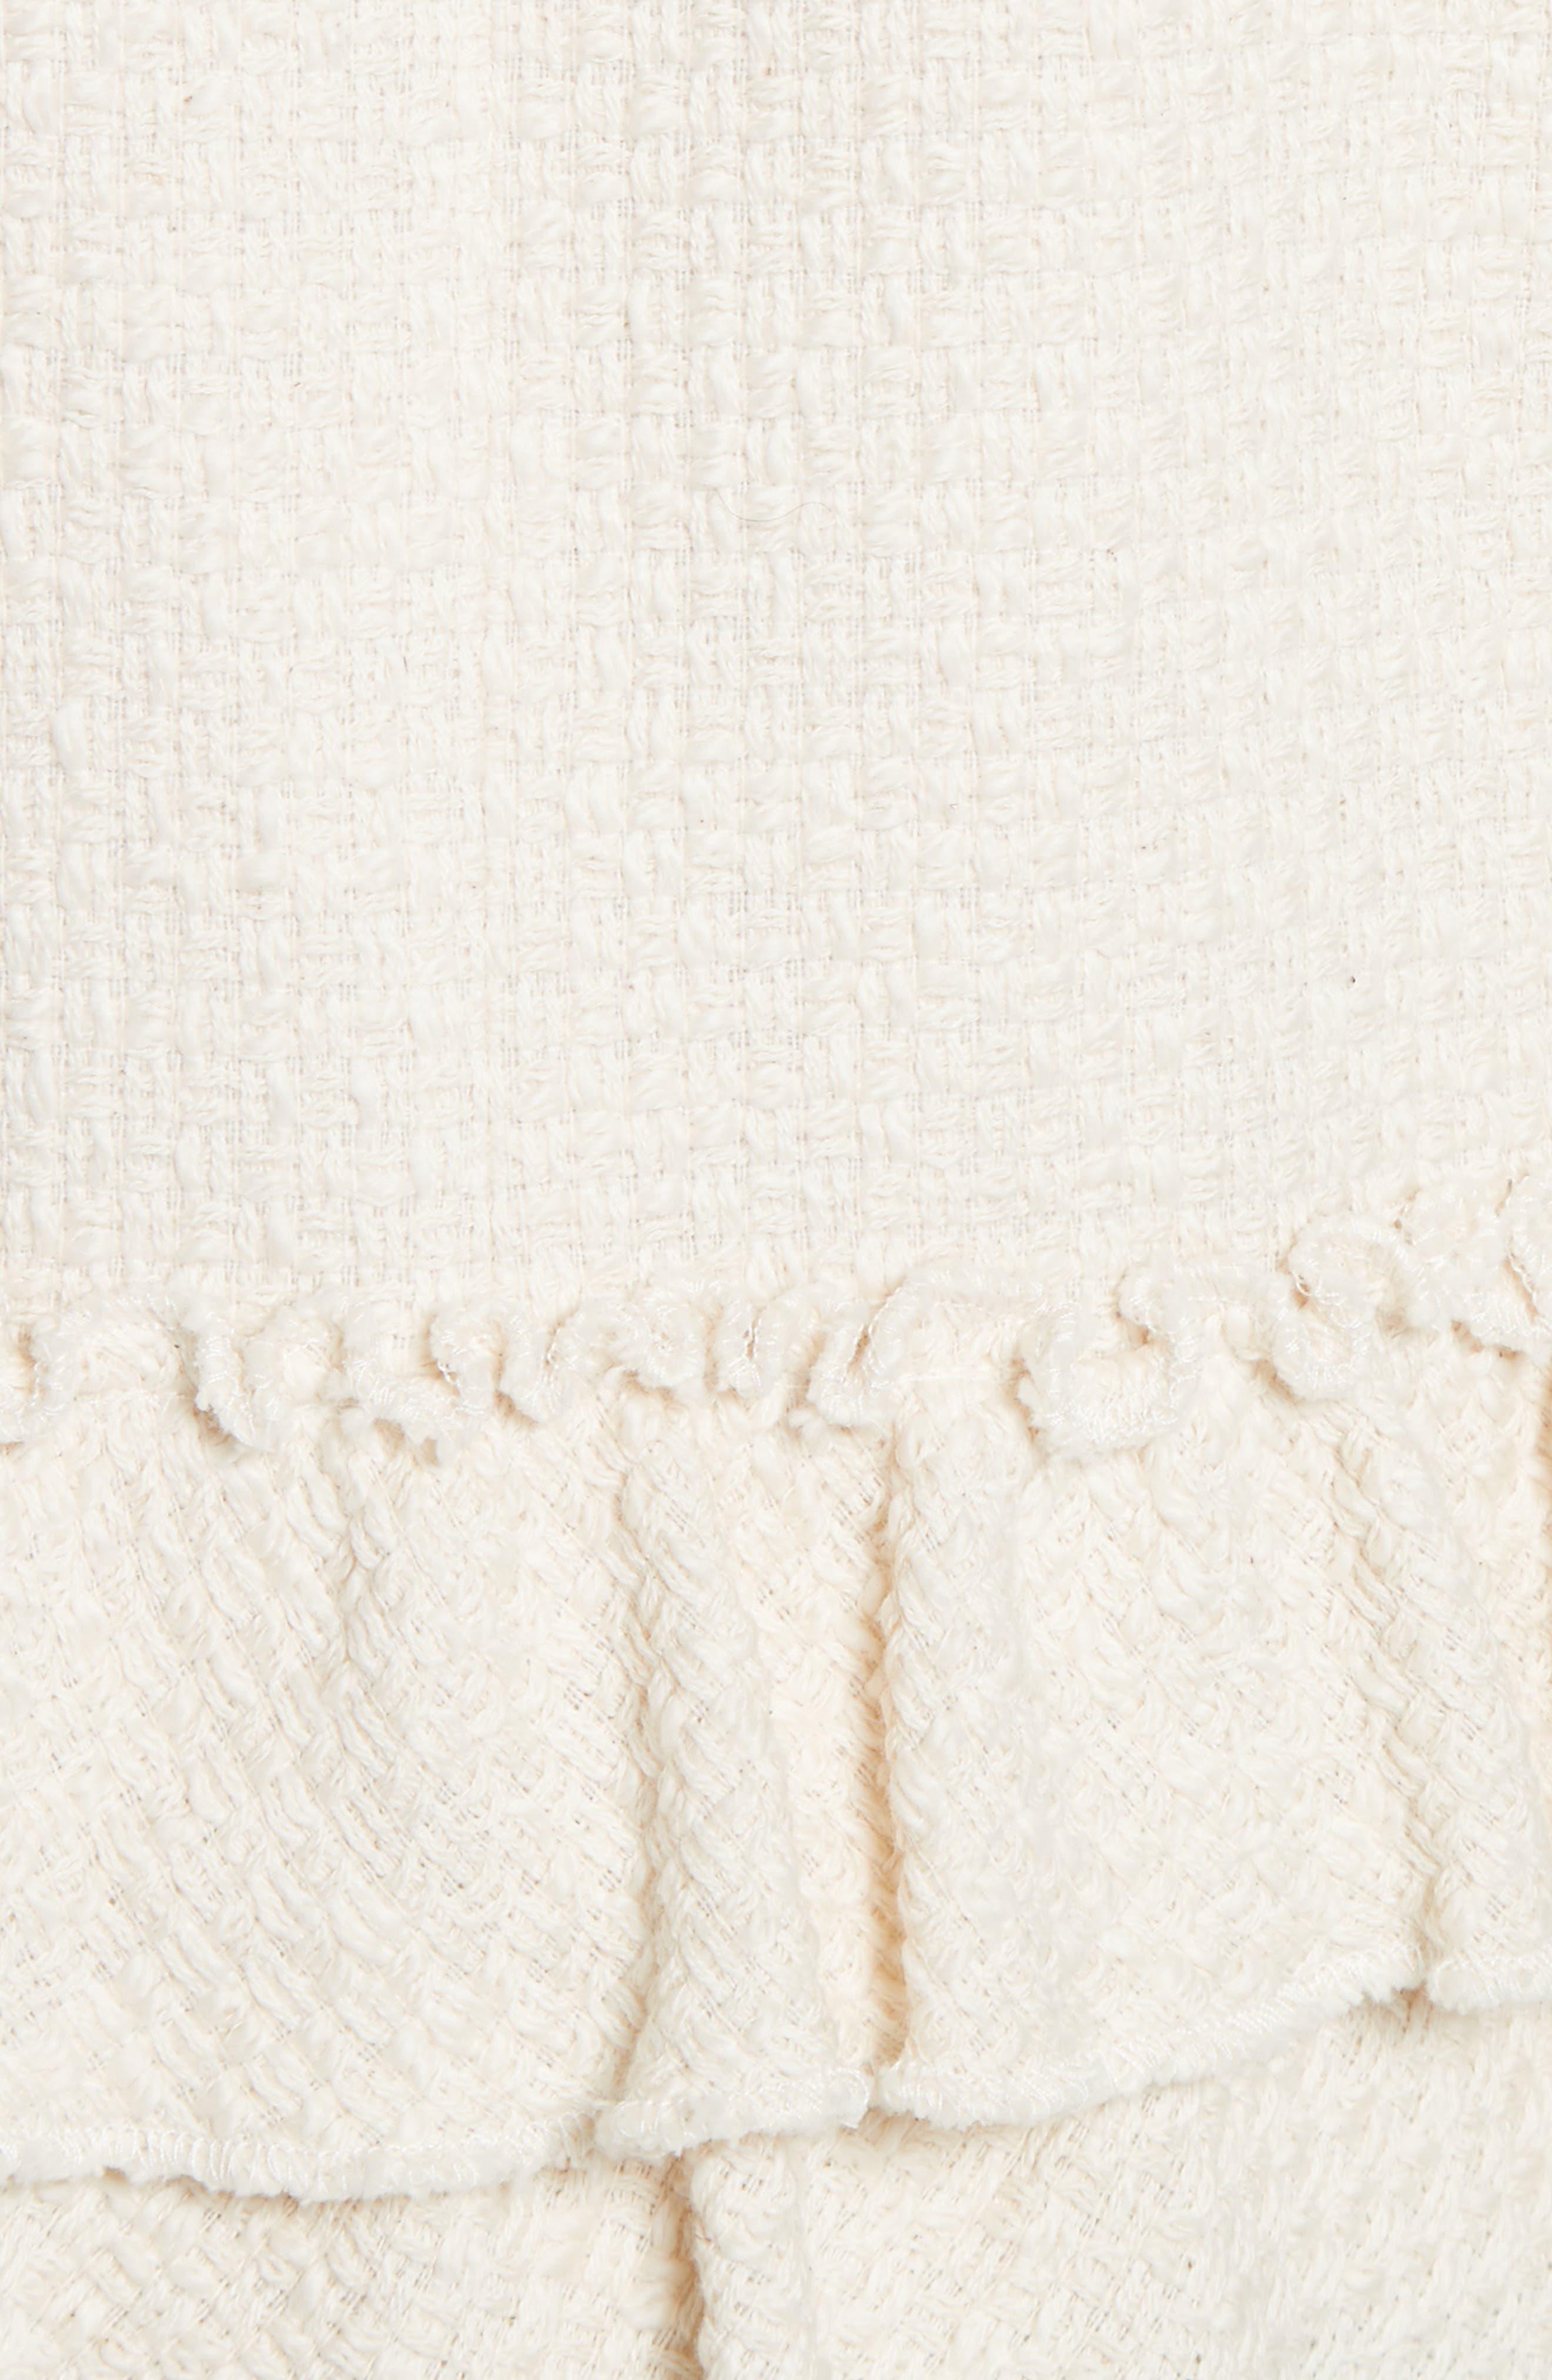 Frill Tweed Jacket,                             Alternate thumbnail 5, color,                             901